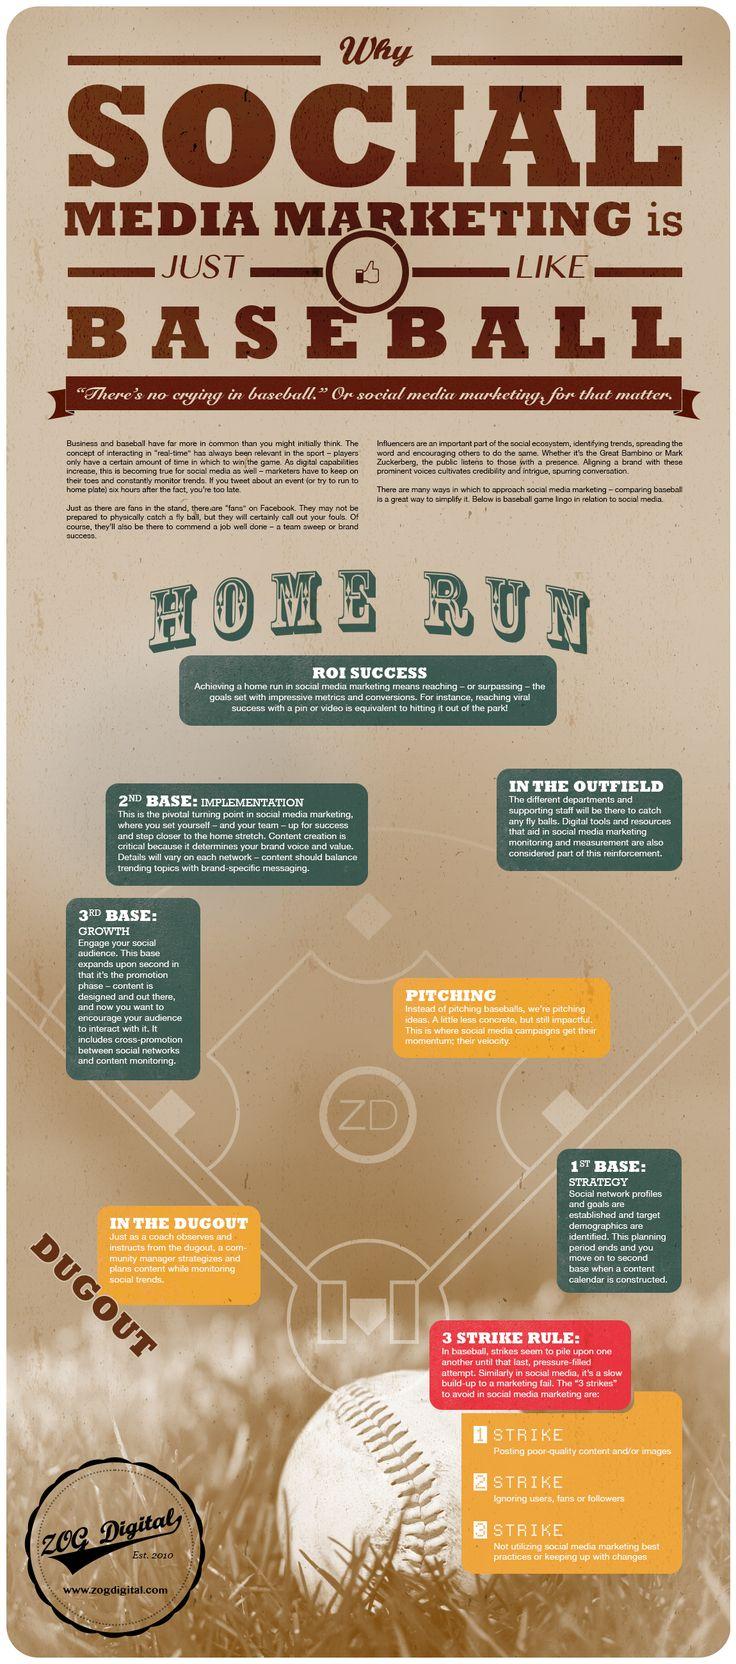 Why Social Media Marketing Is Just Like Baseball